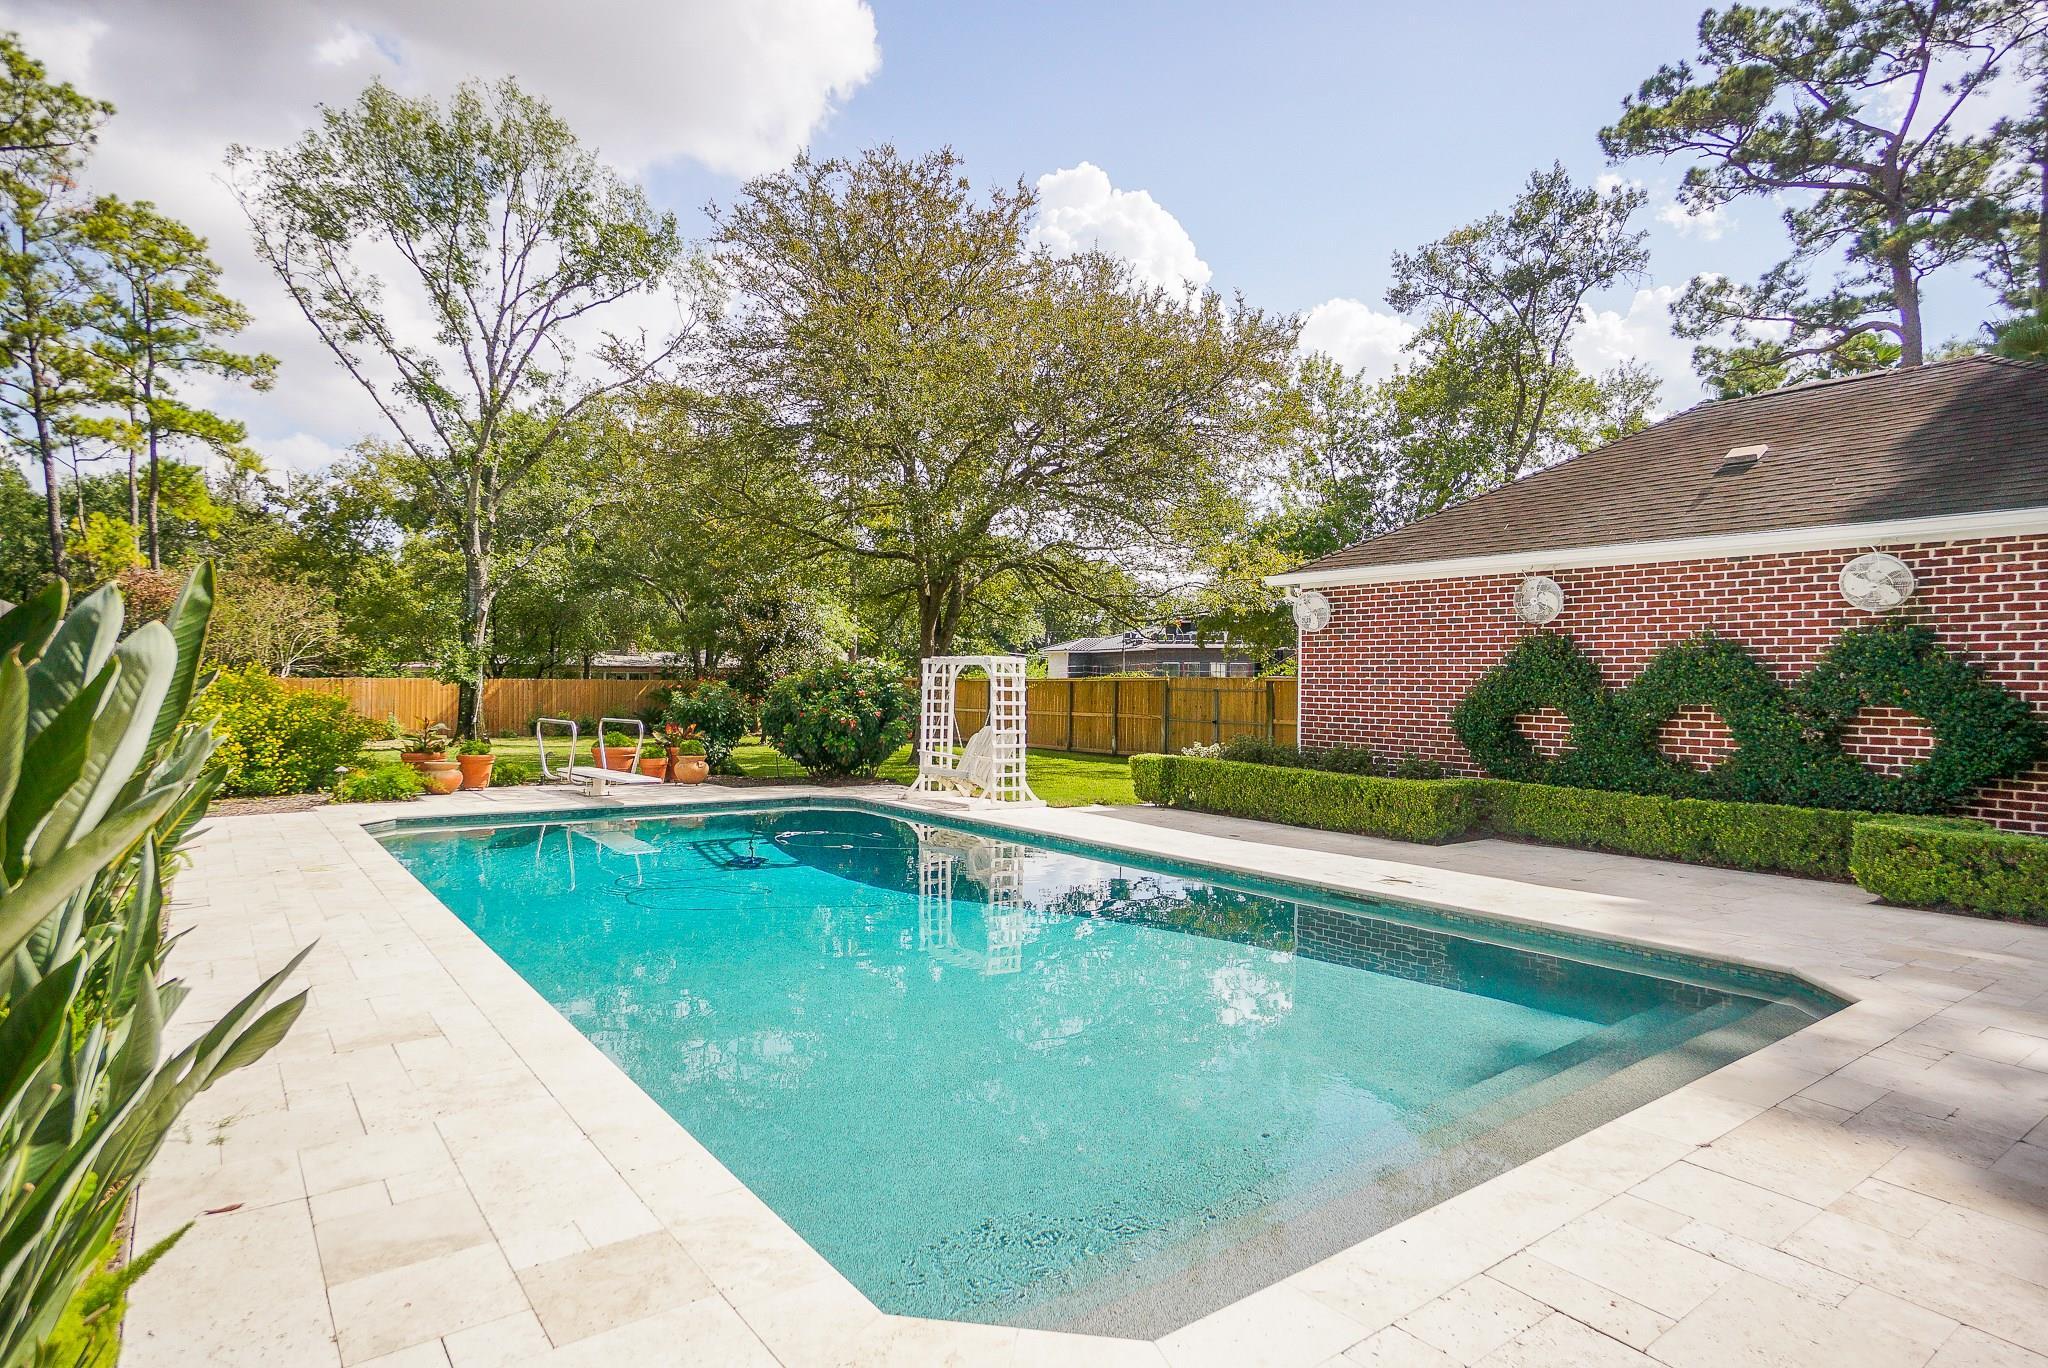 30 Shady Lane E Property Photo - Houston, TX real estate listing